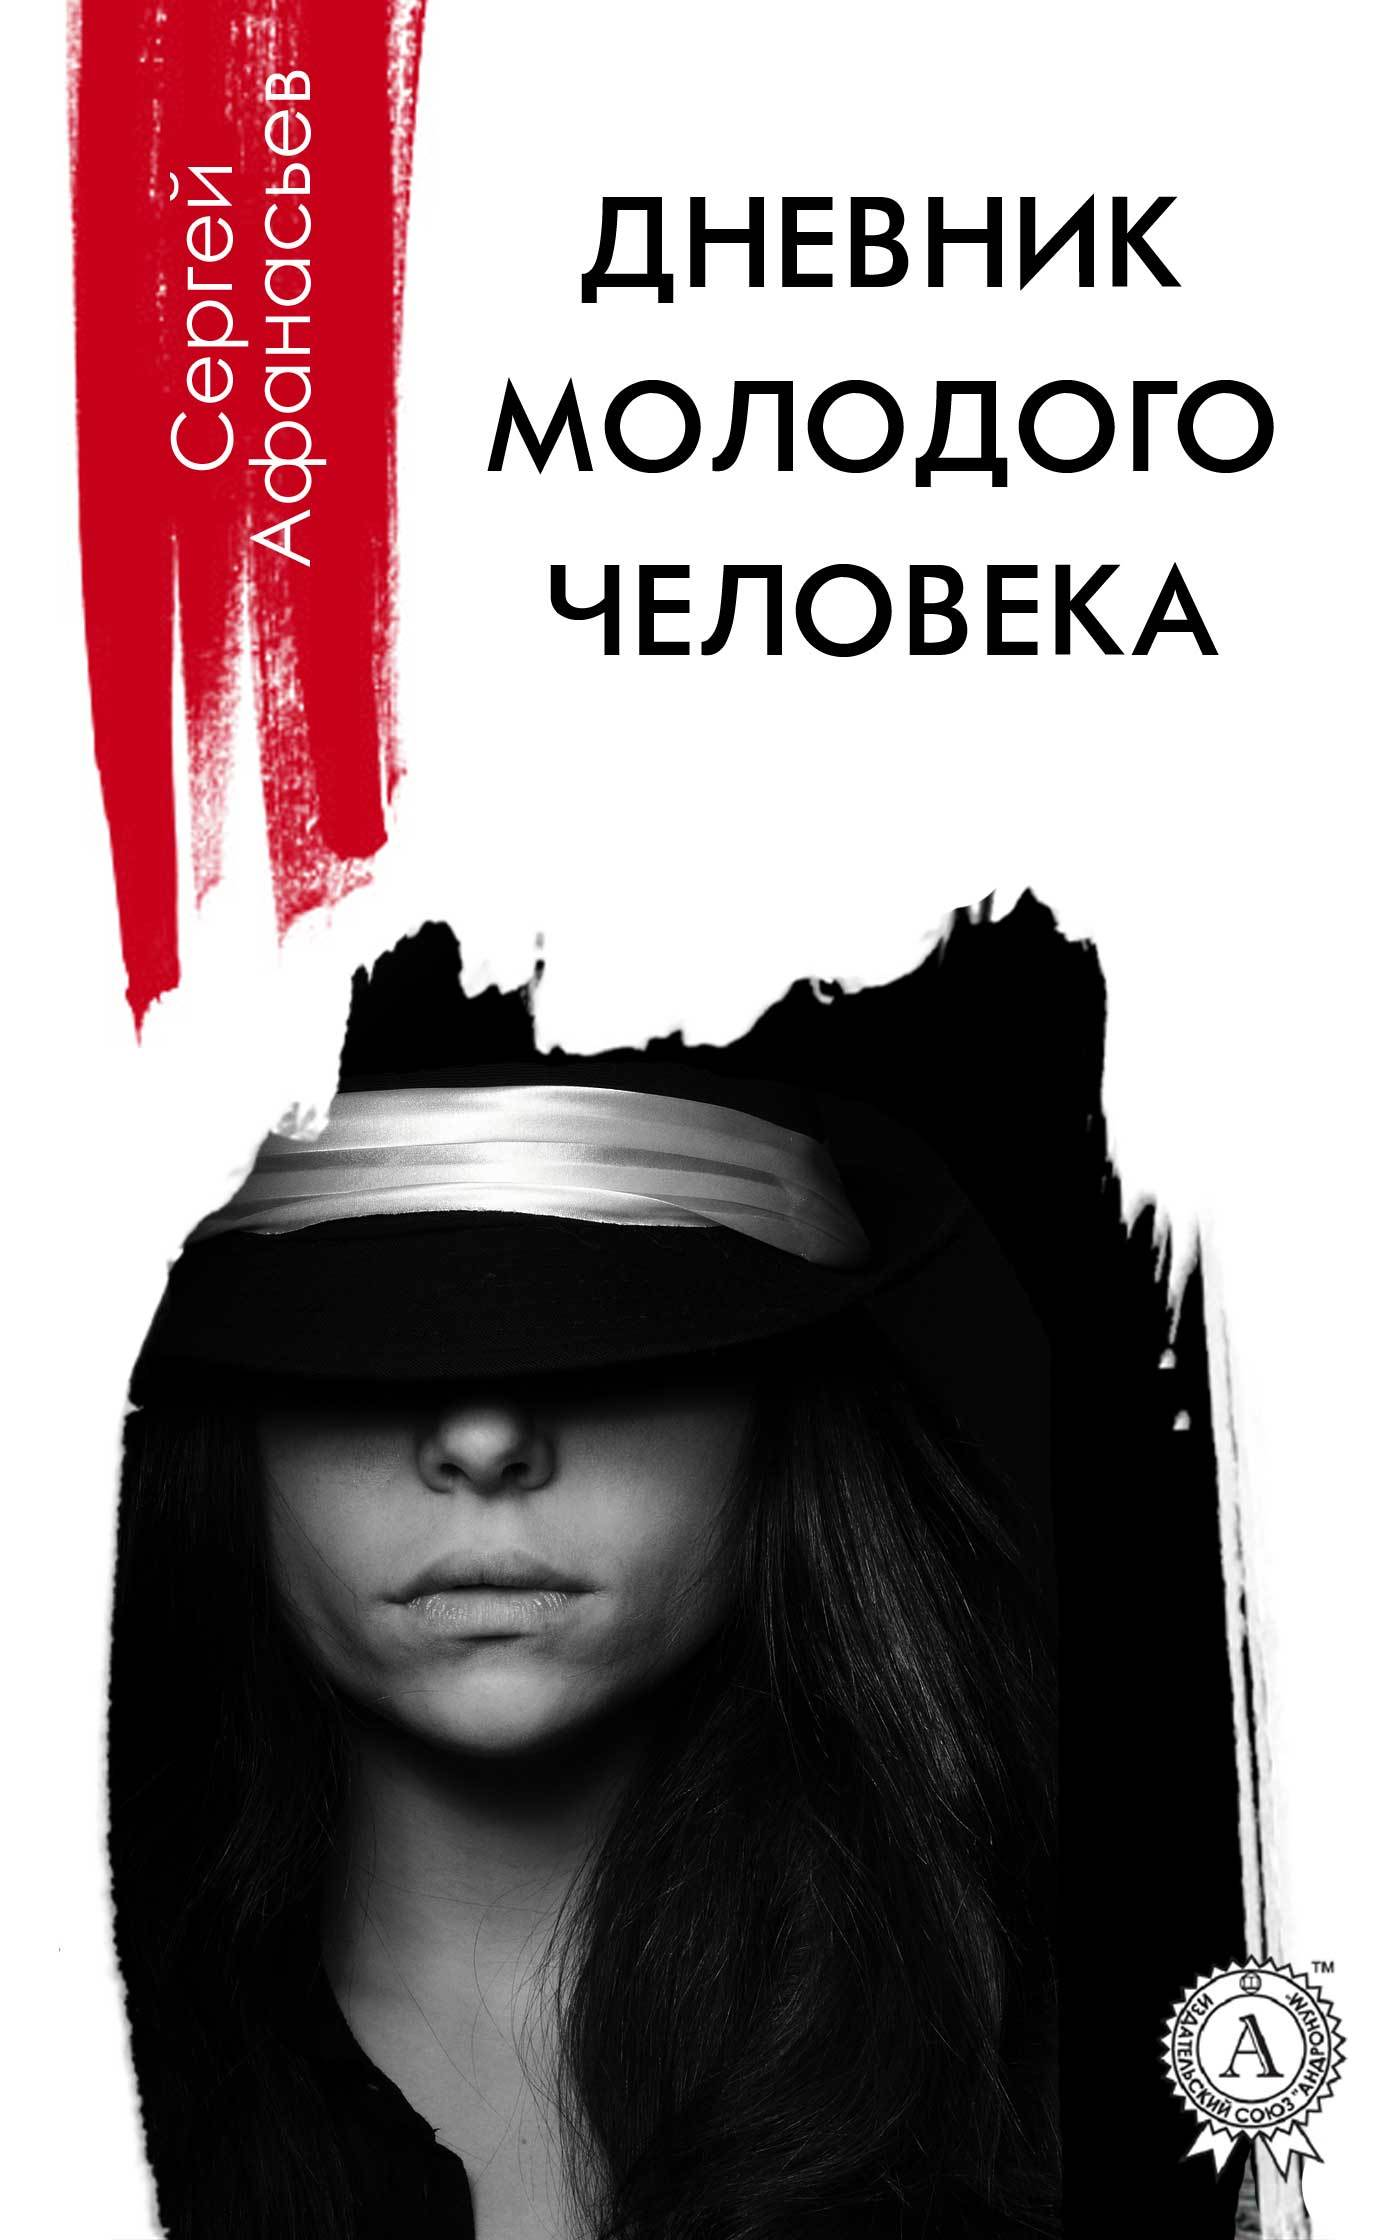 Сергей Афанасьев Дневник молодого человека цена